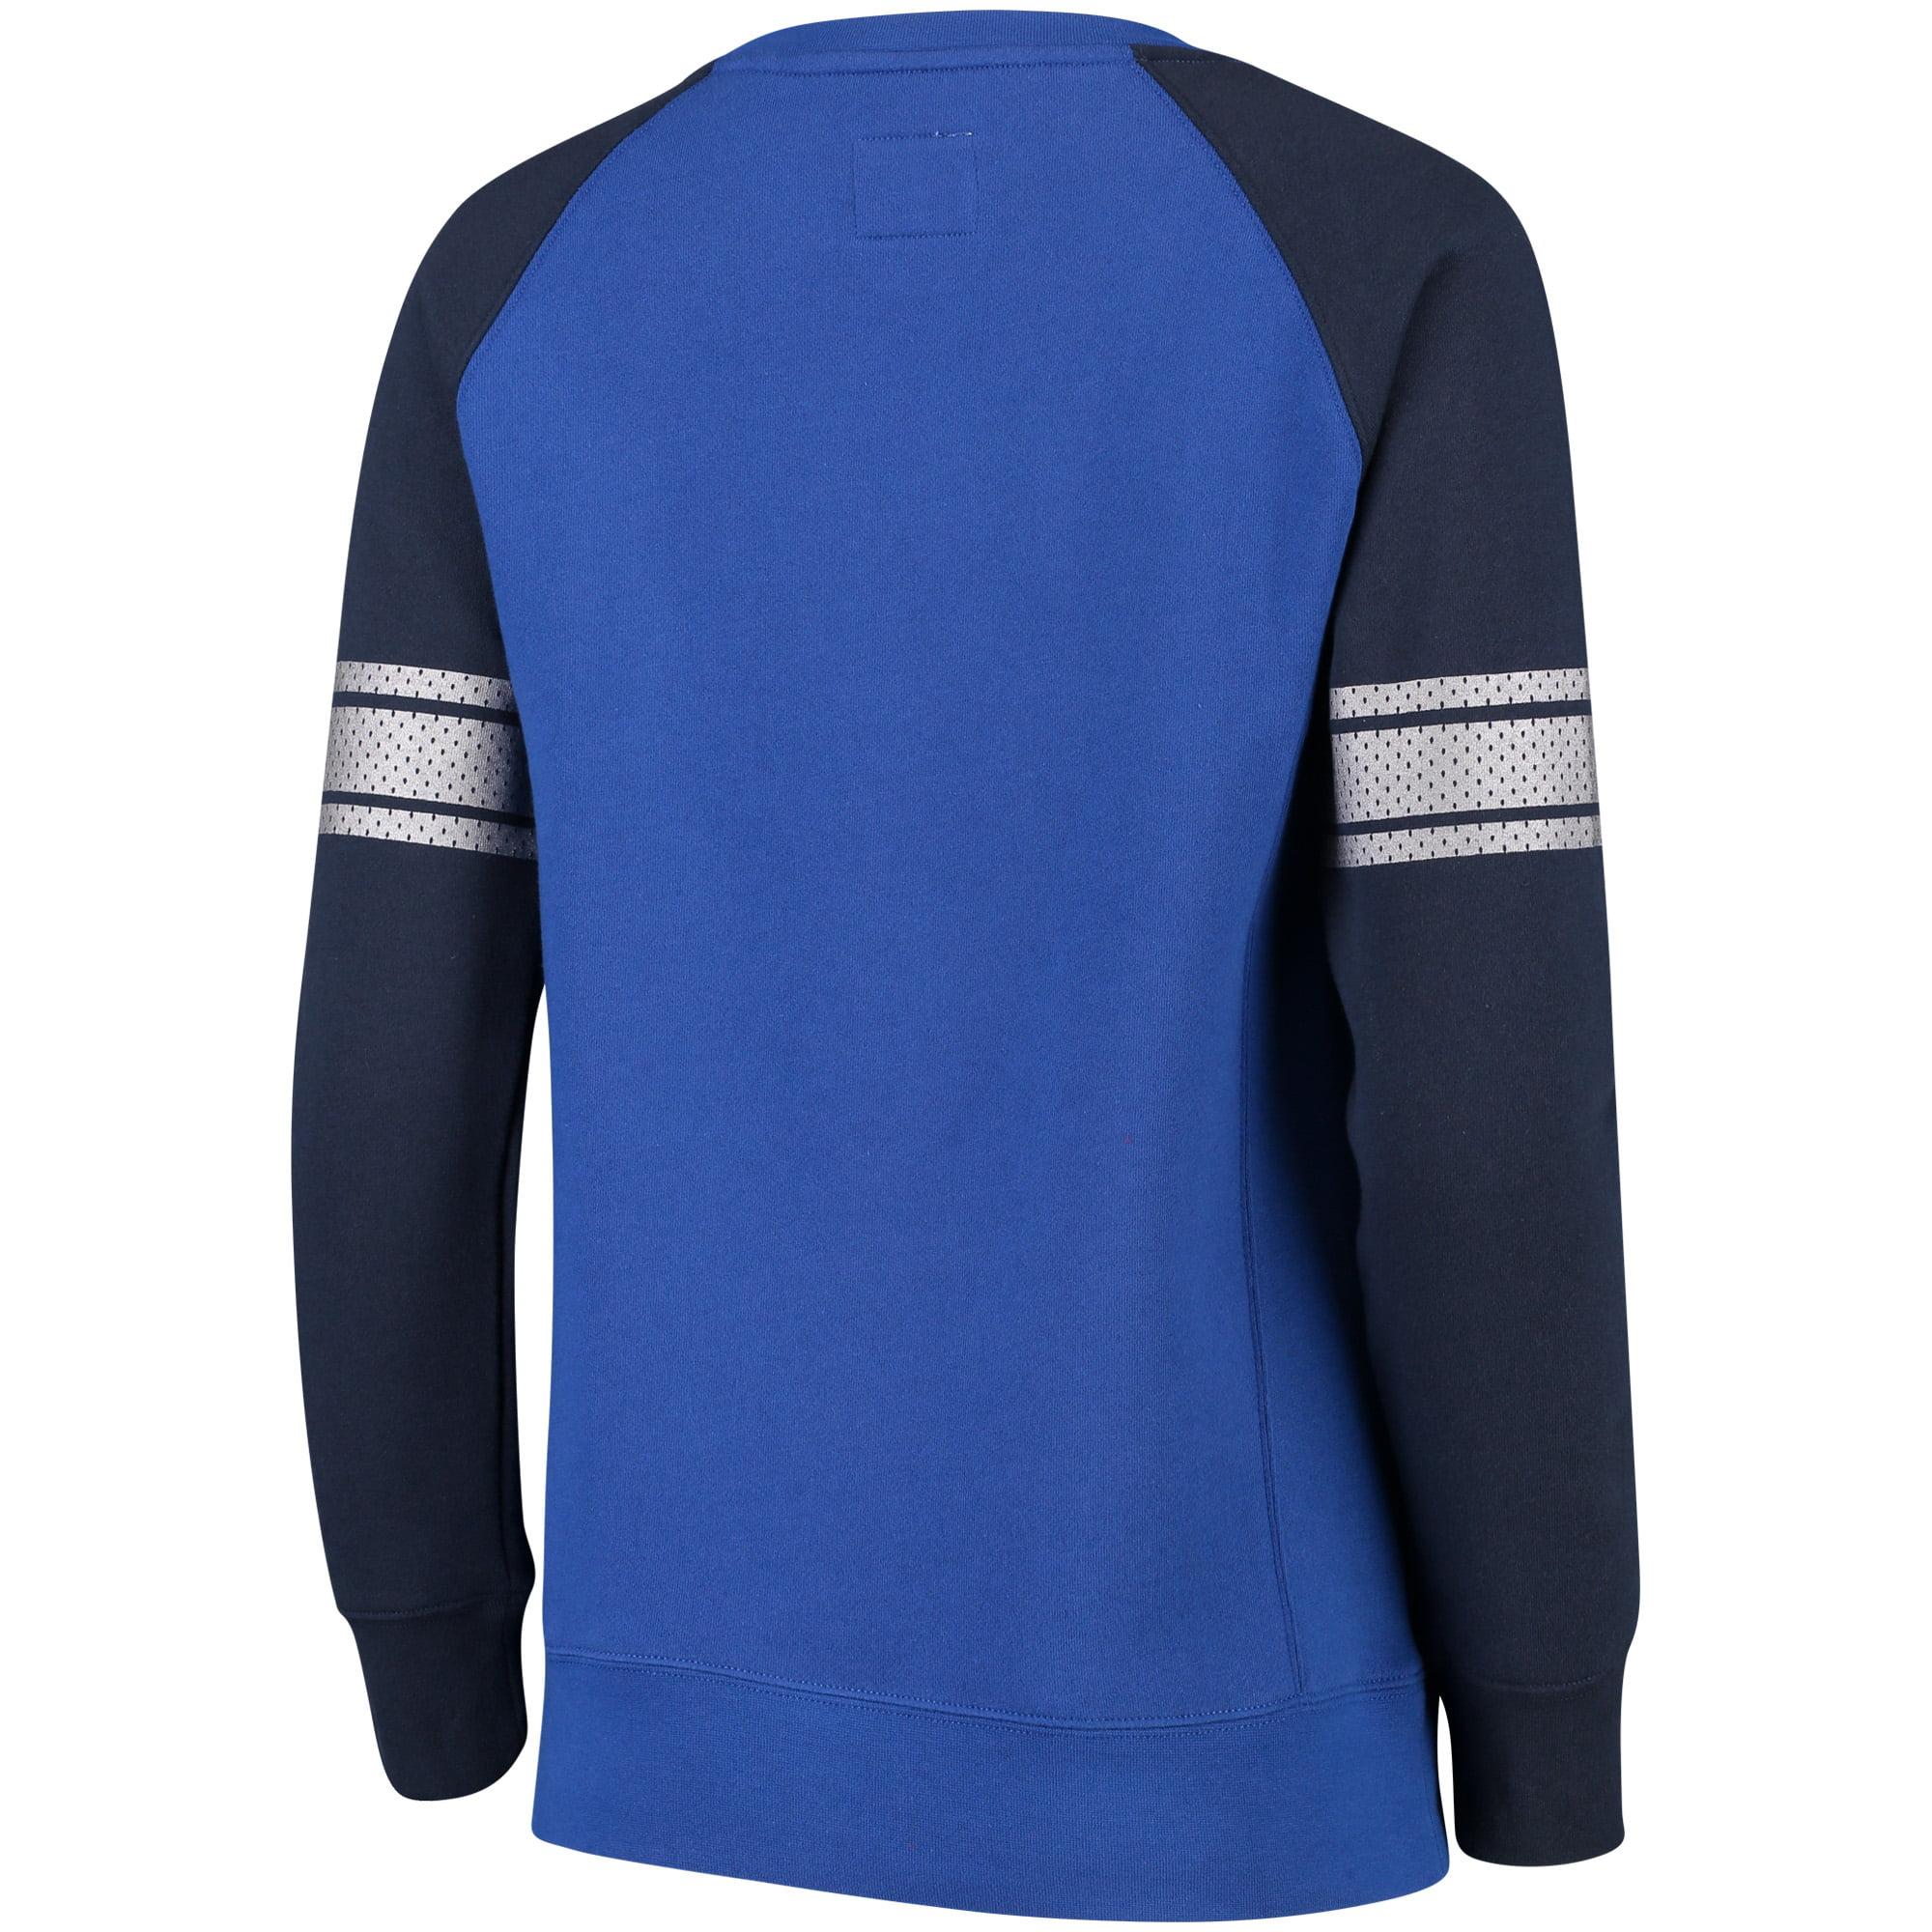 332f6f175 Dallas Mavericks Fanatics Branded Women's Iconic Pullover Sweatshirt - Royal /Navy - Walmart.com